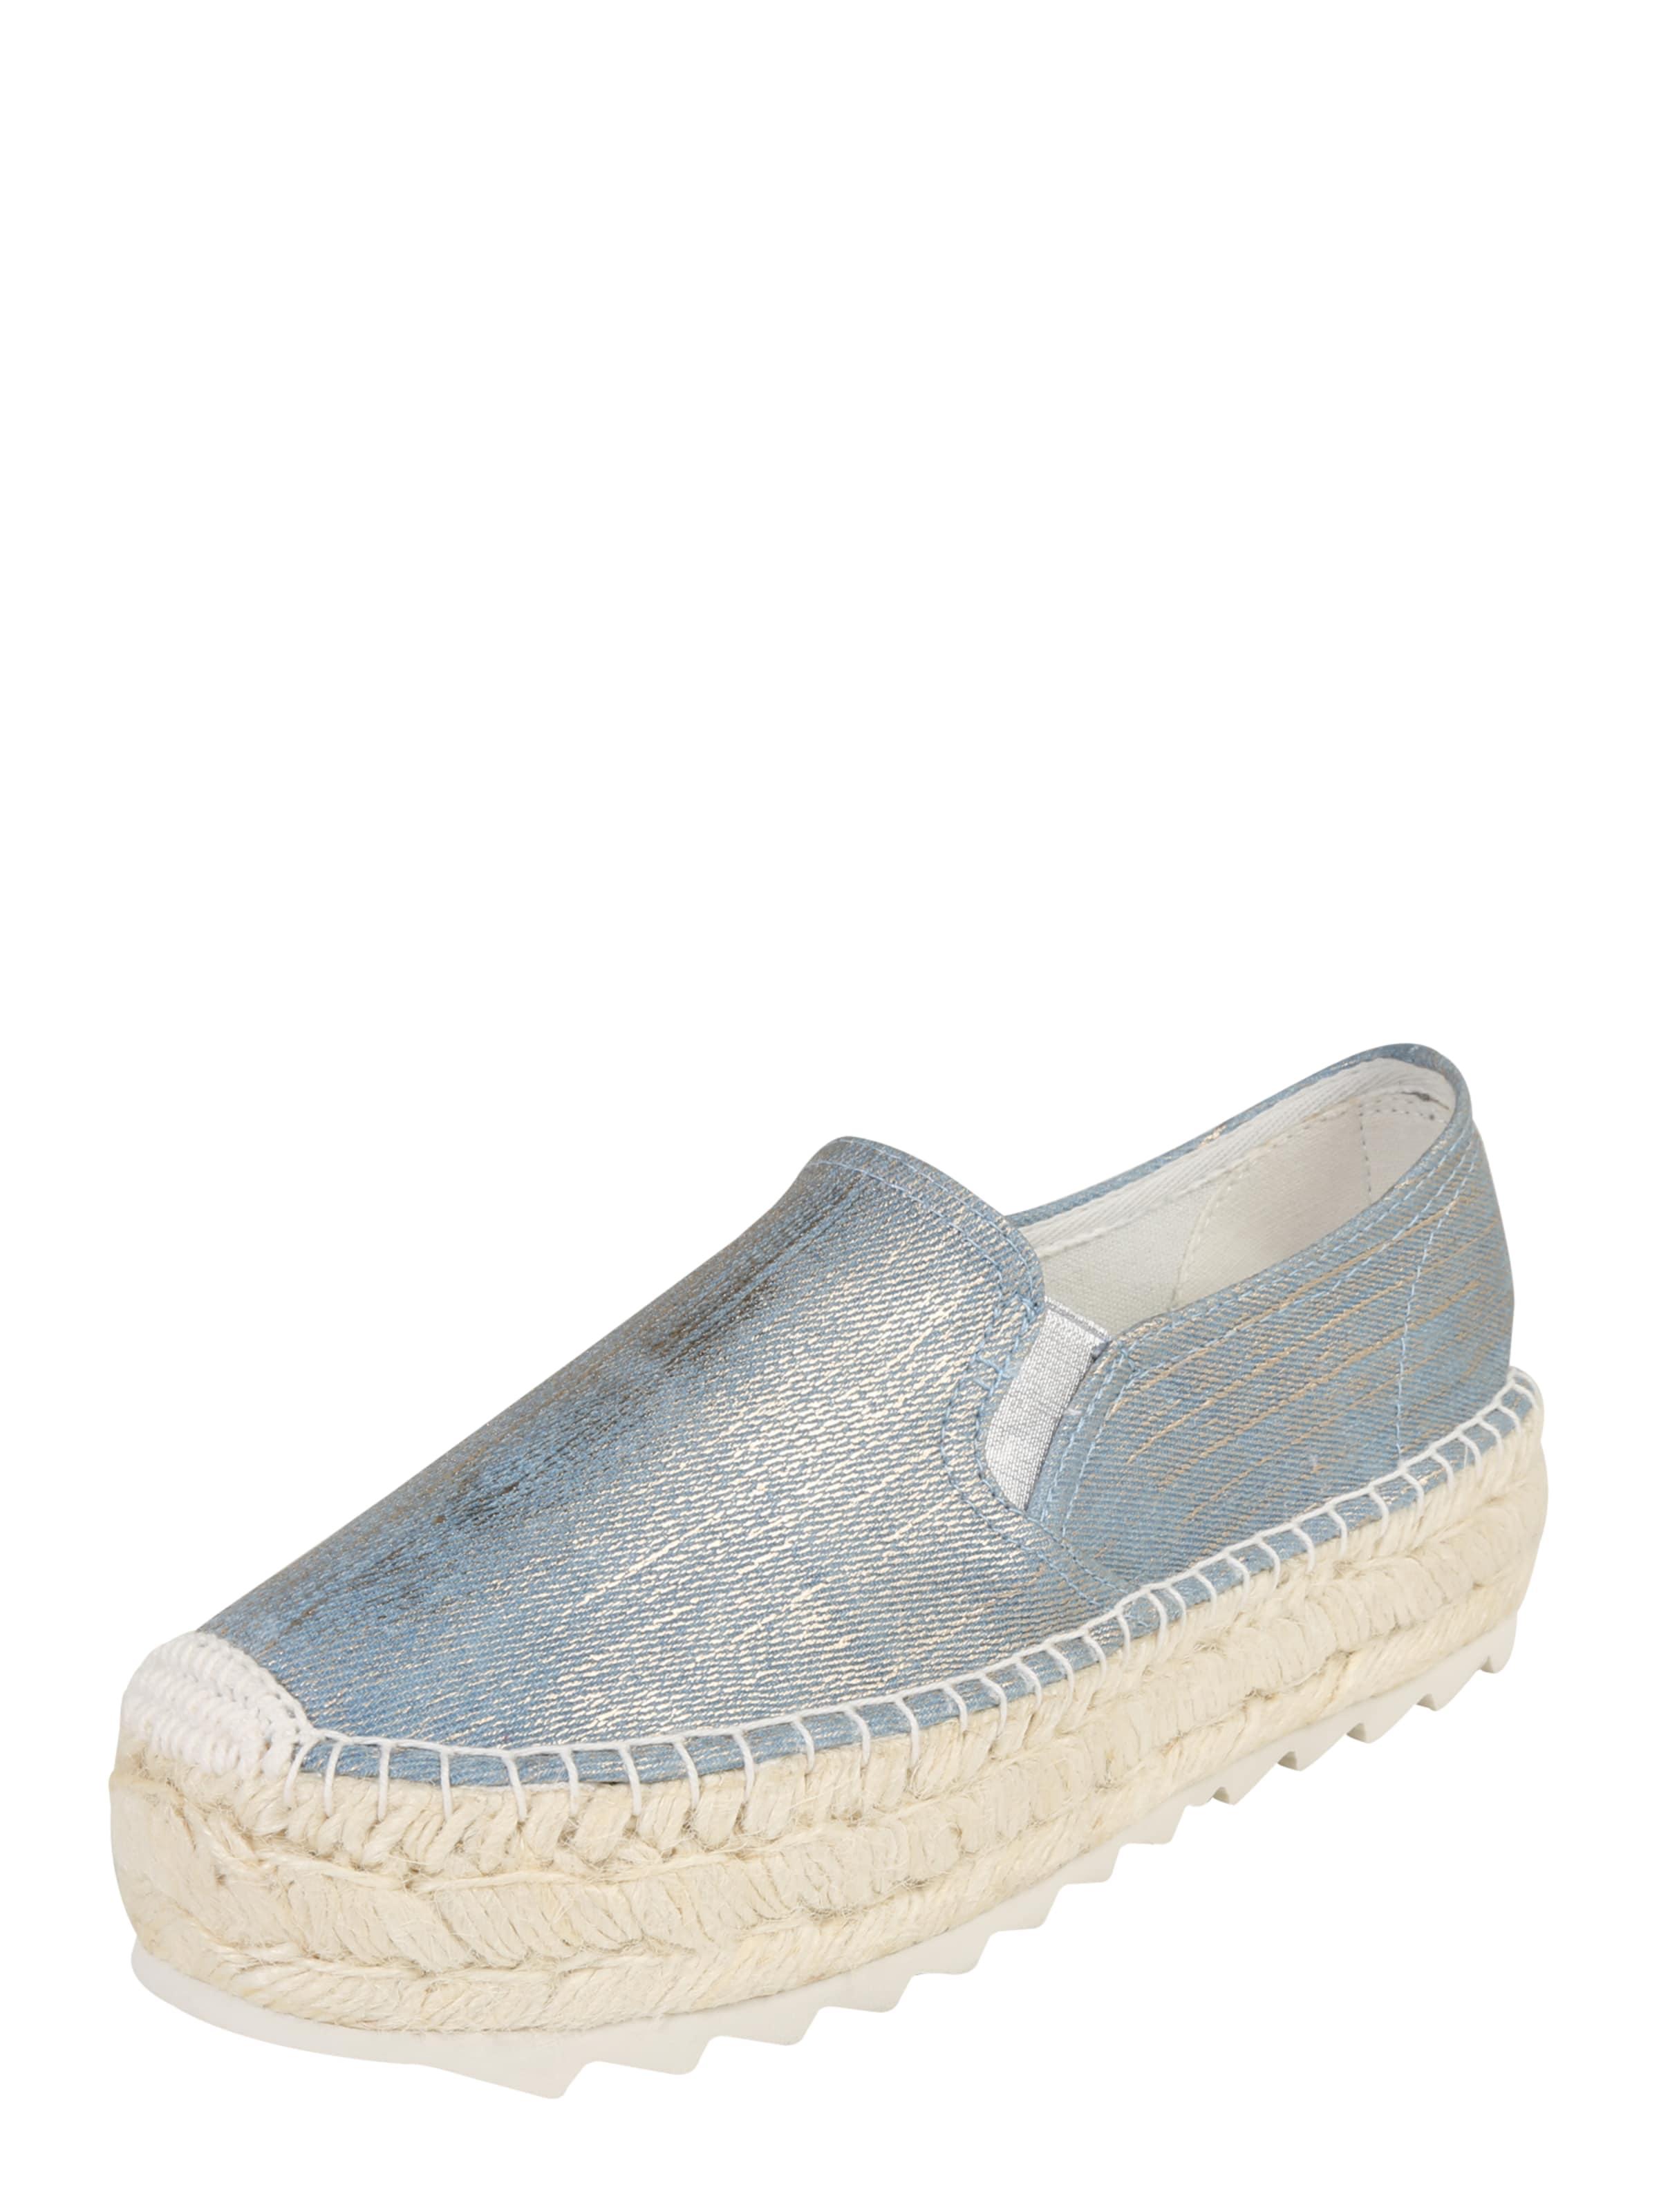 REPLAY Espadrilles ELINOR Verschleißfeste billige Schuhe